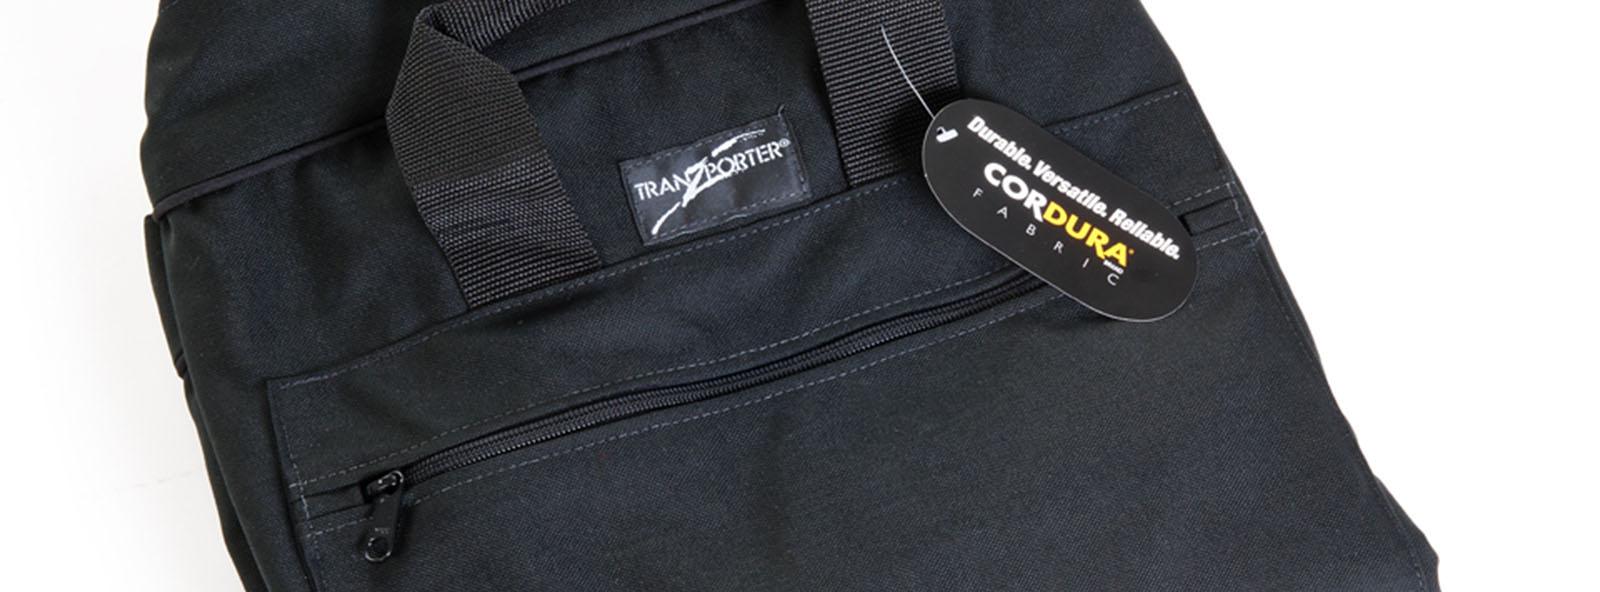 Folded portfolio case with pocket zipper